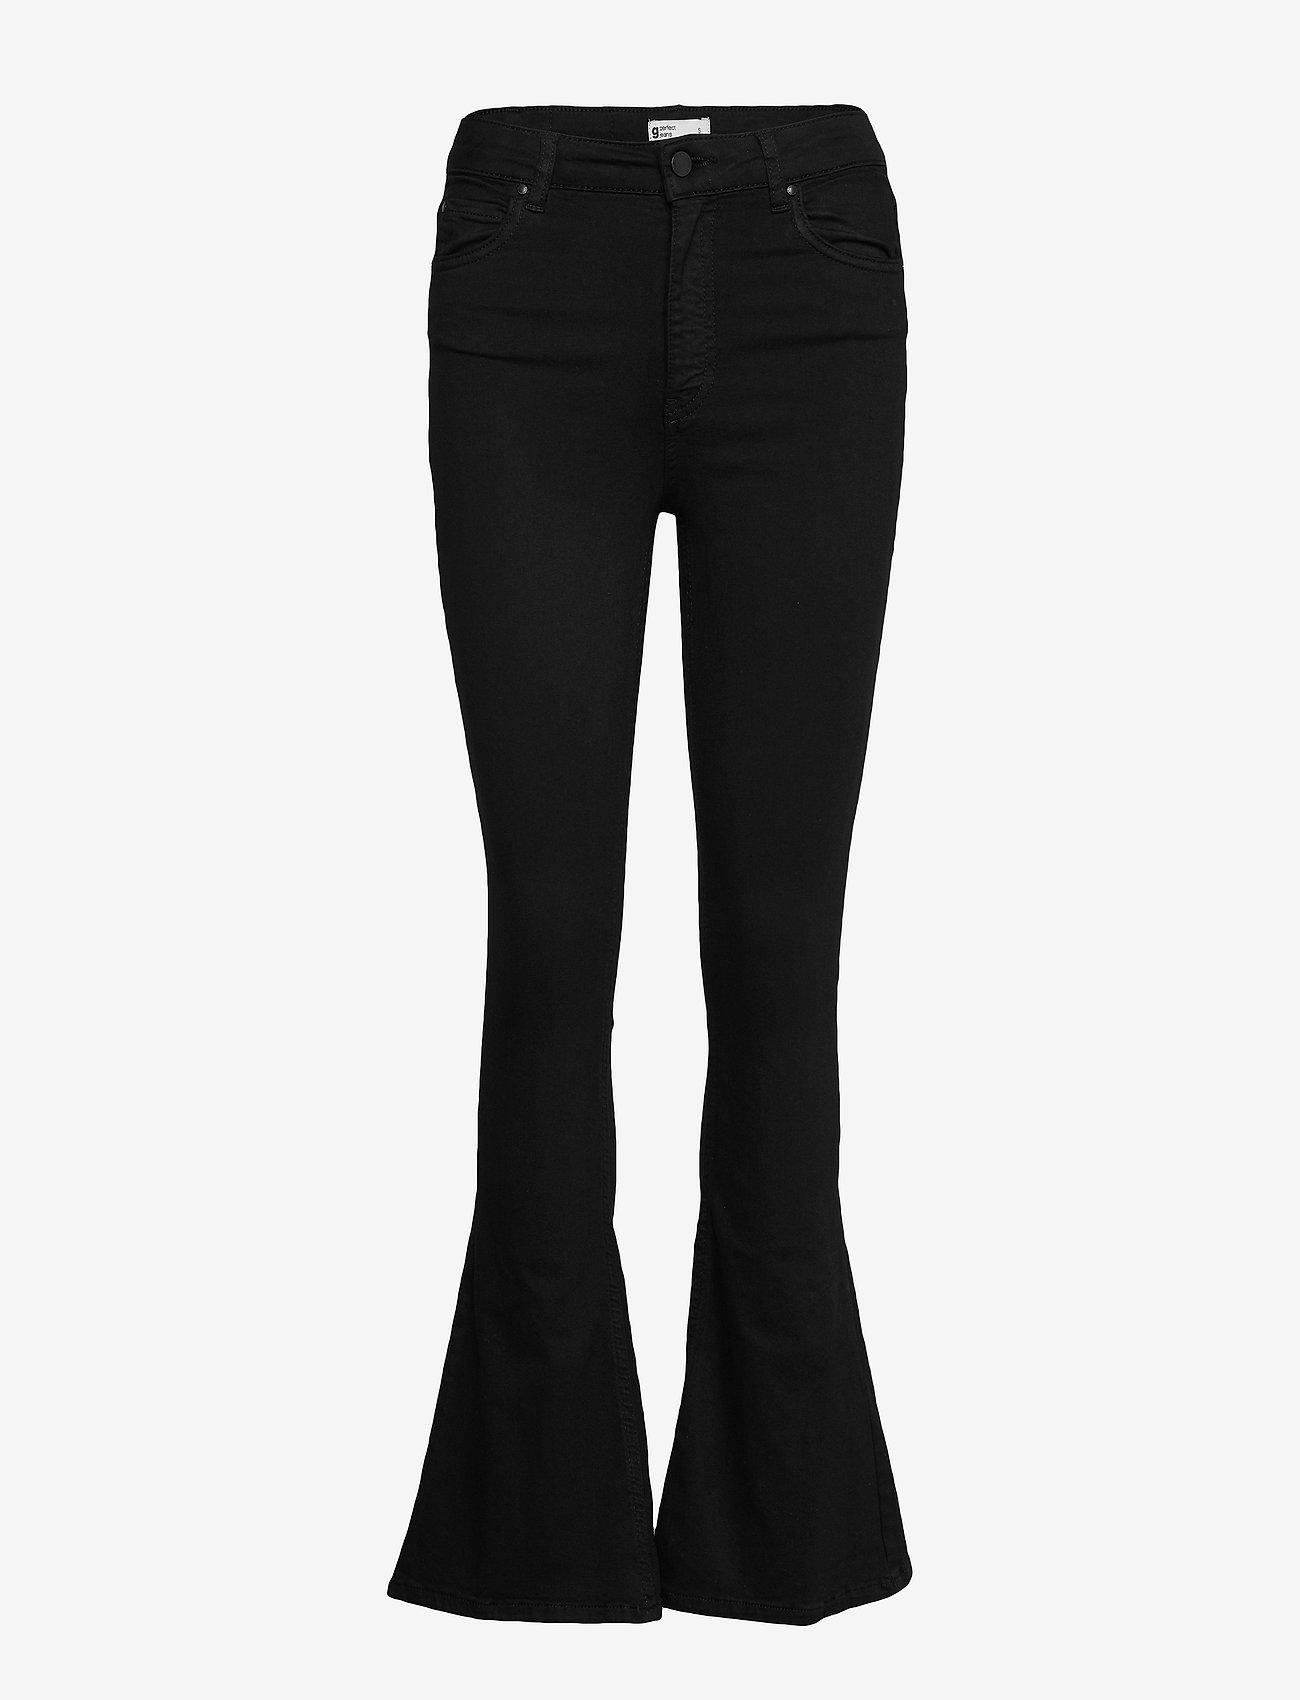 Gina Tricot - Natasha bootcut jeans - boot cut jeans - black - 0